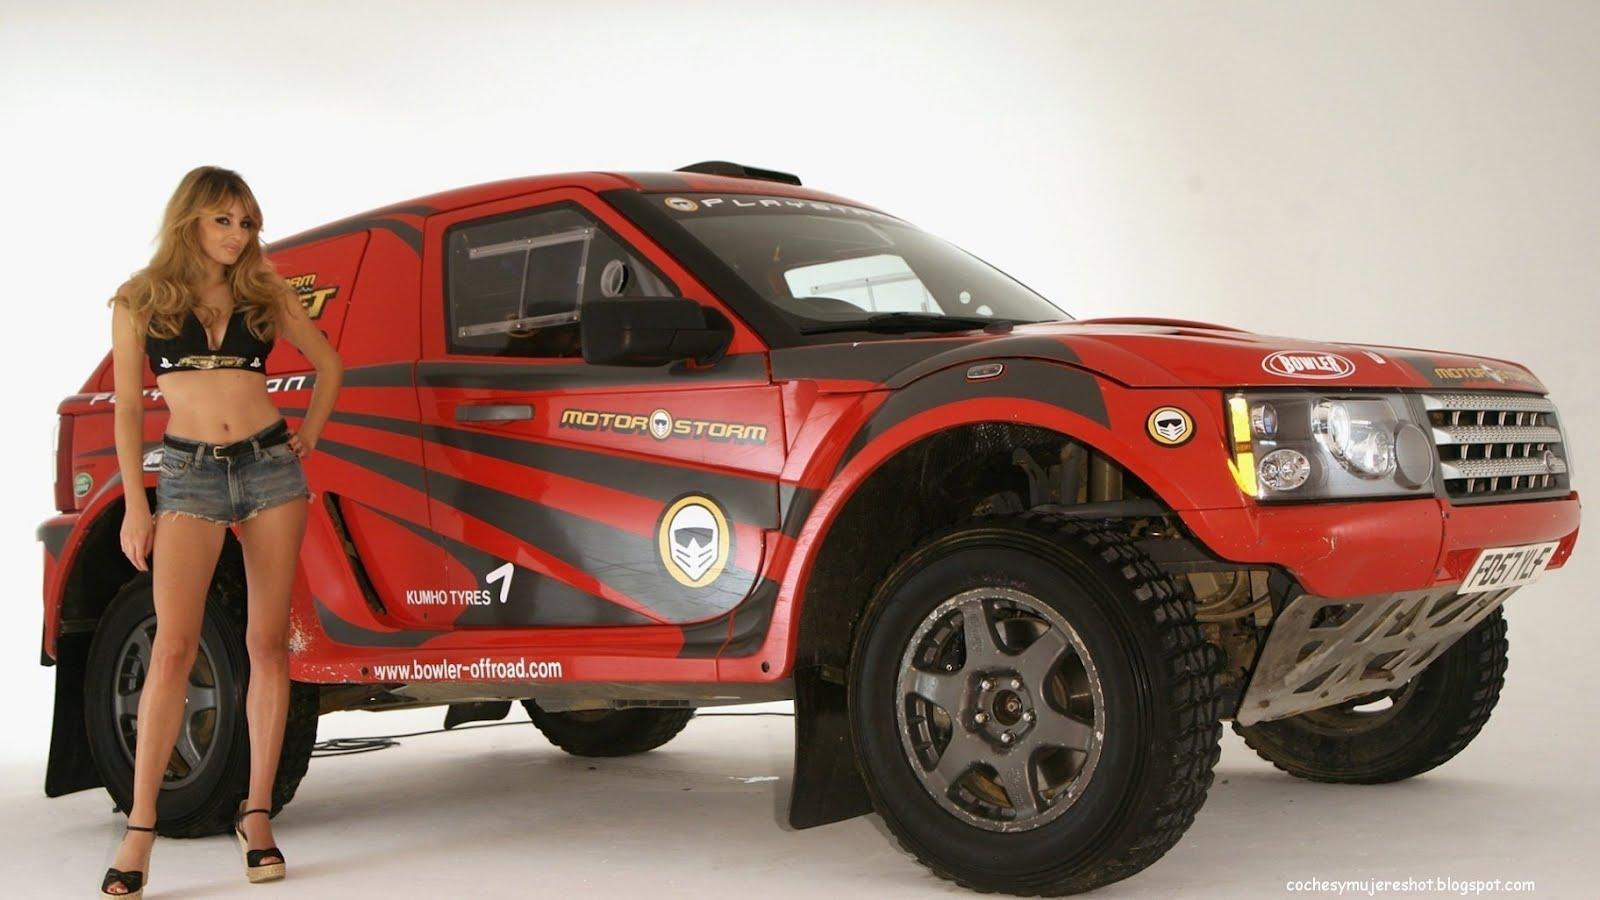 http://3.bp.blogspot.com/--jkoXV6Ows0/T097nX8ElhI/AAAAAAAAAr8/V9dw1S12rF0/s1600/rojo-Land-Rover-dakar-rally-camioneta-4x4-chicas-hd-desktop-jean-babe-wallpapers-546.jpg